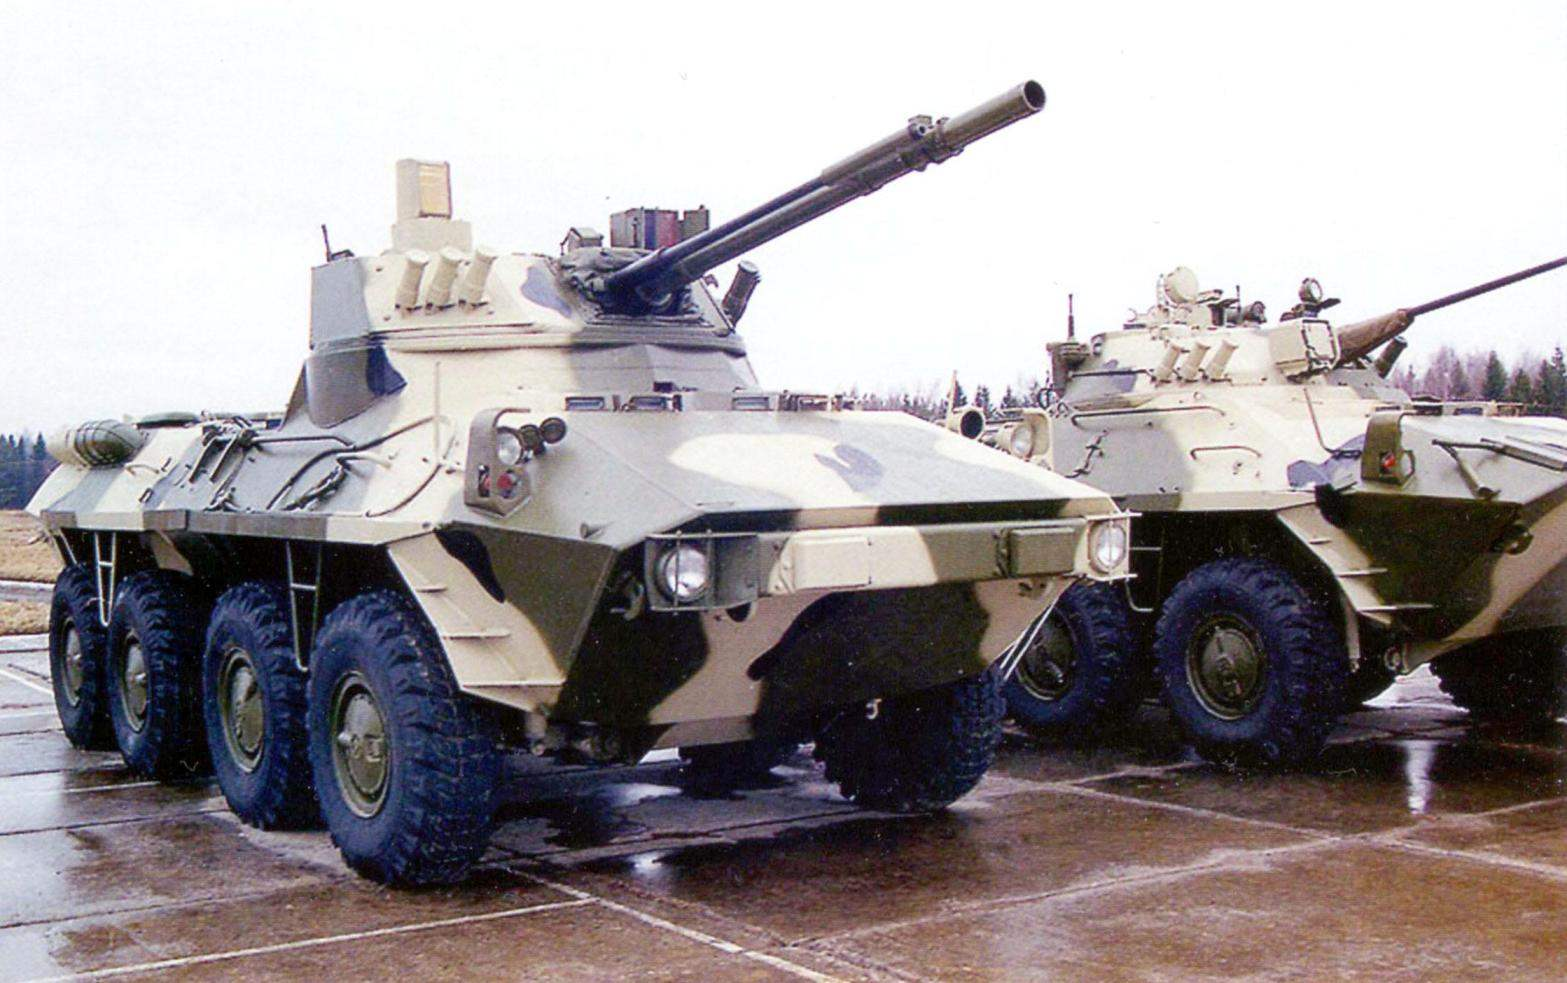 На переднем плане БТР-90М с боевым модулем «Бахча-У». За ним стоит БТР-90 с 30-мм пушкой 2А42